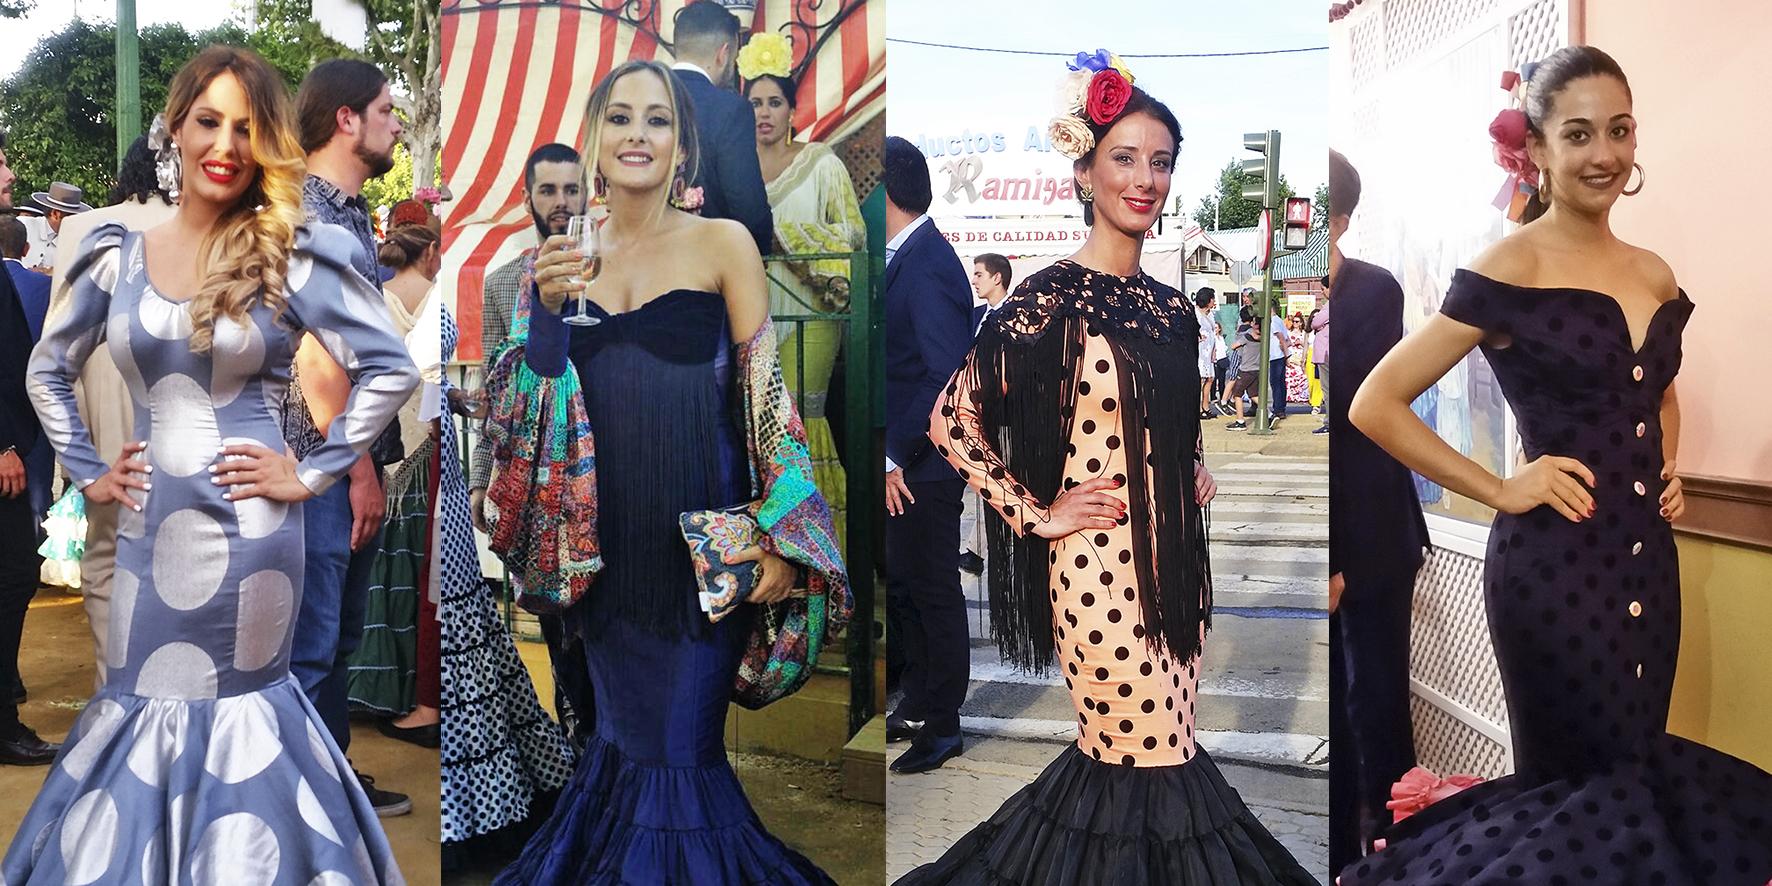 Flamencas en la Feria de Sevilla 2017